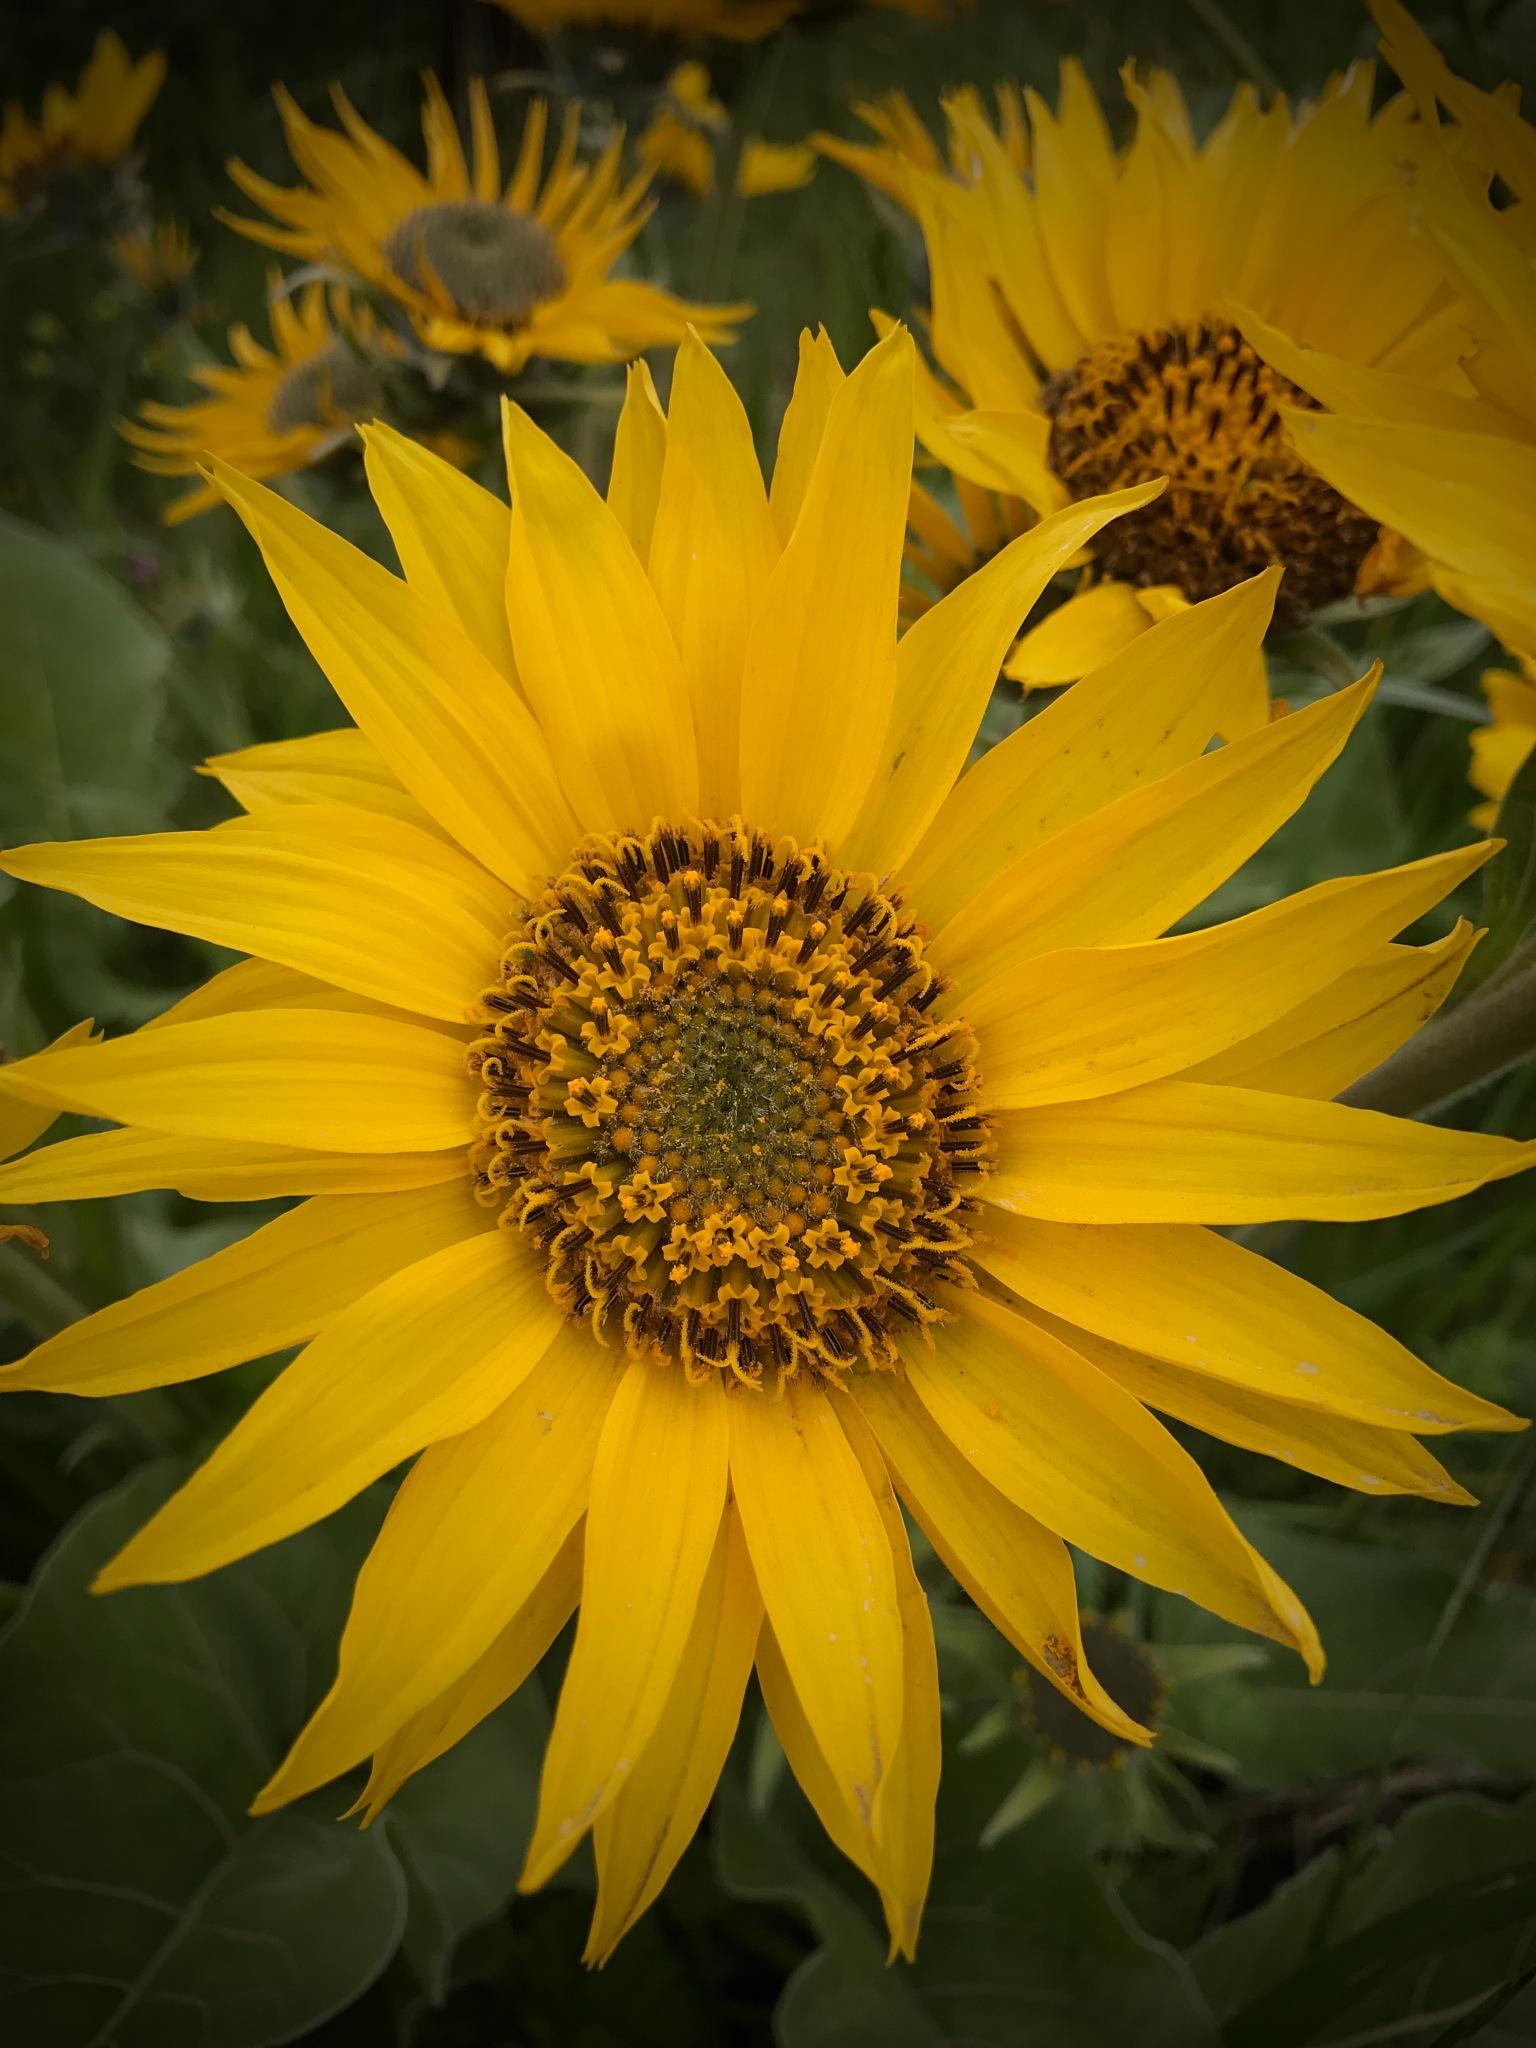 Wild flowers by peyton0104